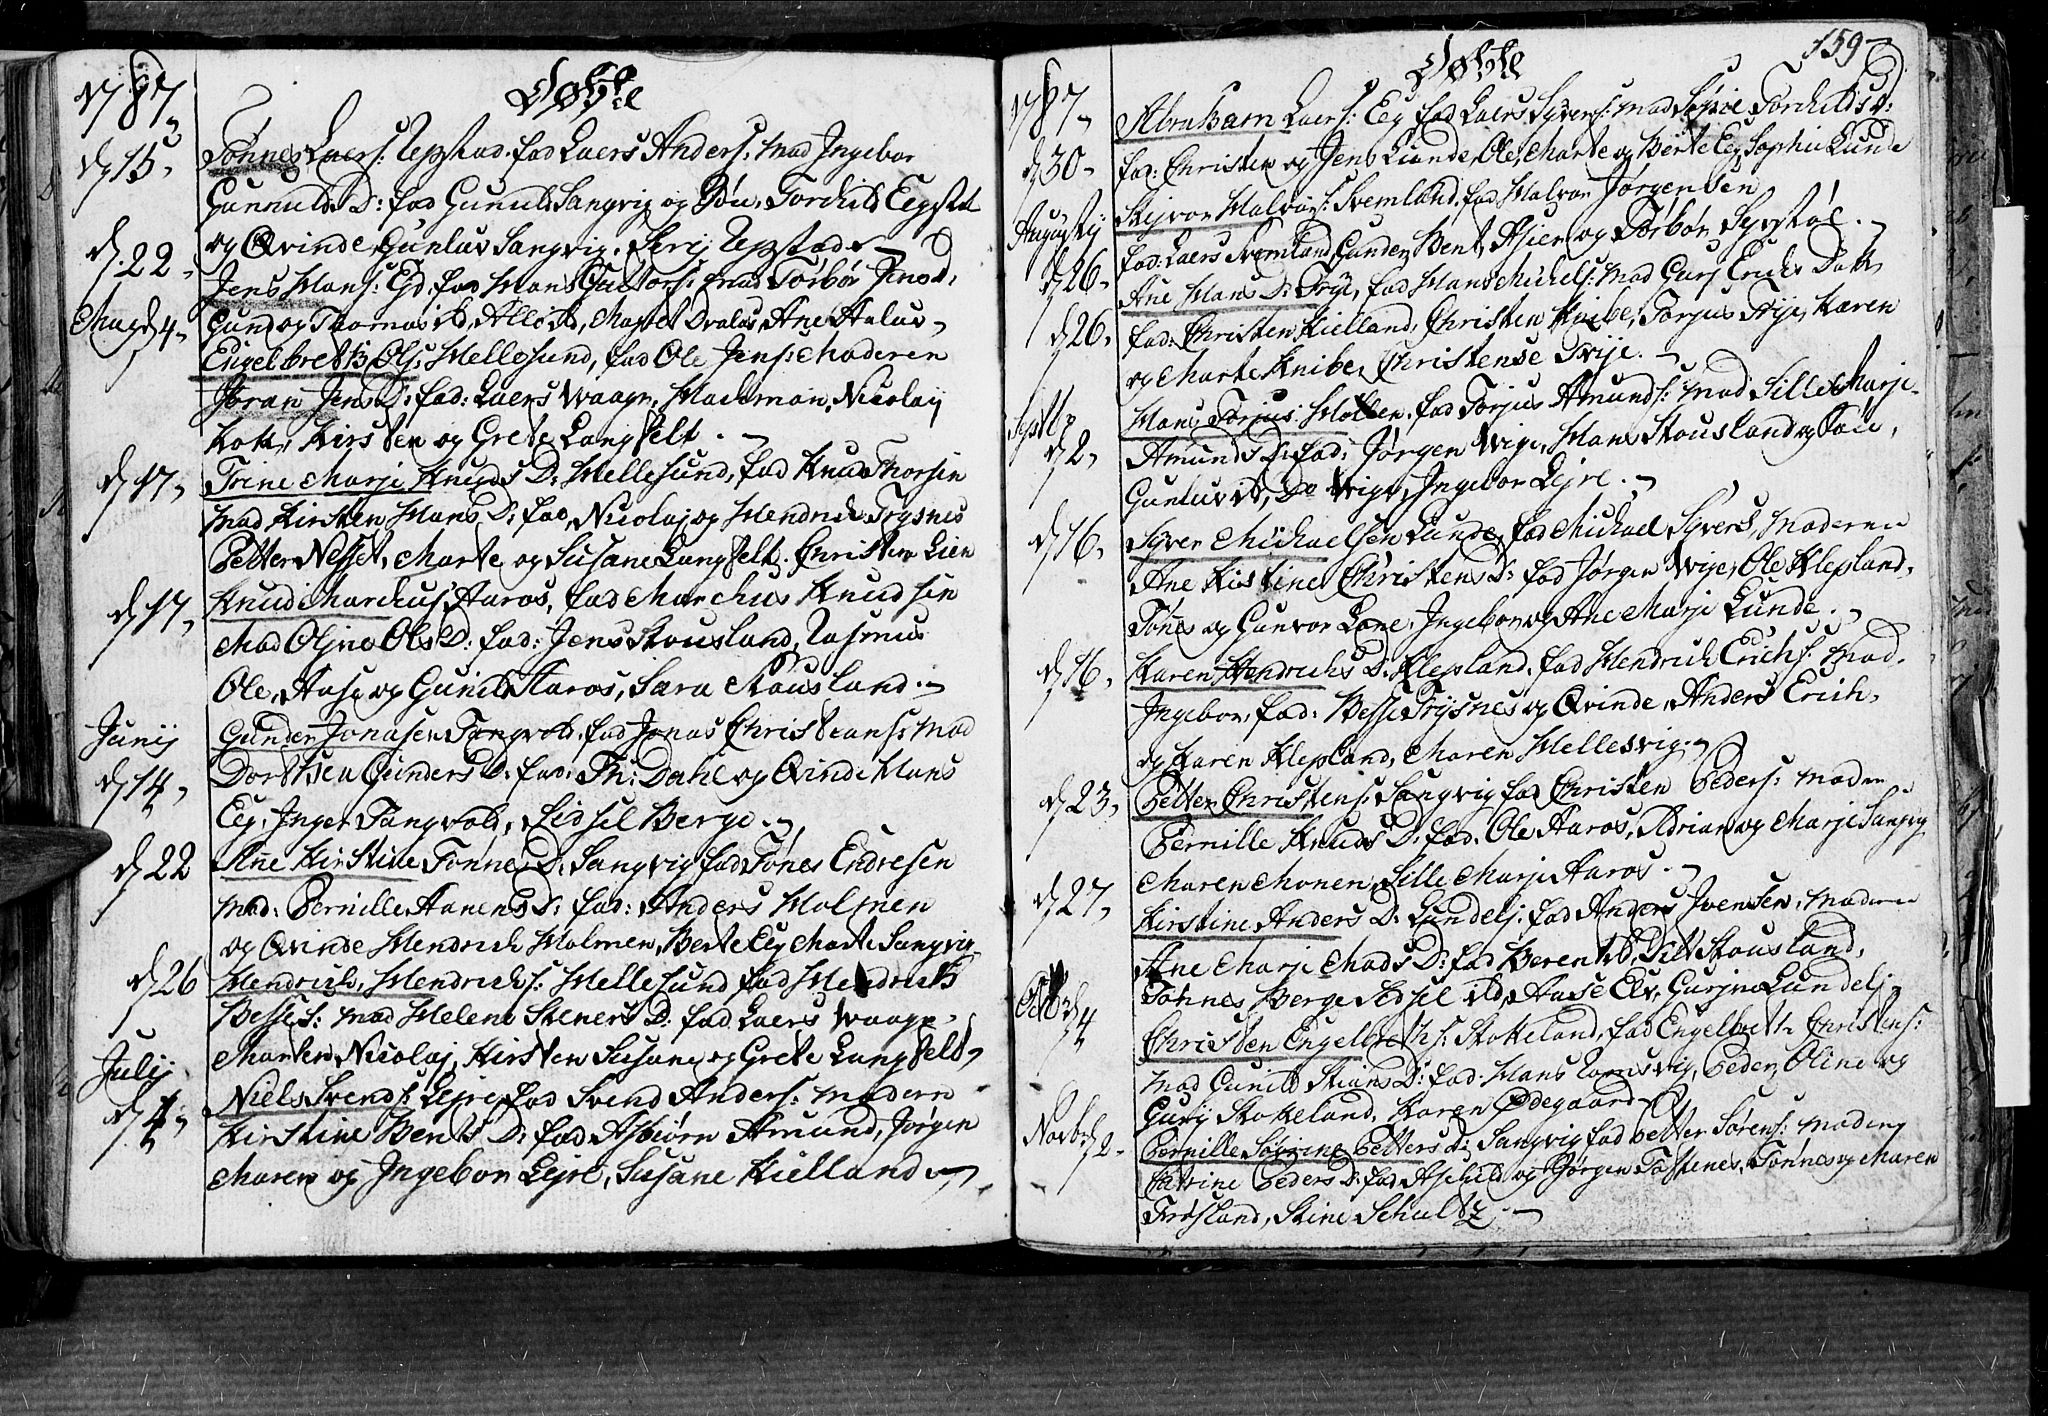 SAK, Søgne sokneprestkontor, F/Fa/Fab/L0004: Parish register (official) no. A 4, 1770-1822, p. 158-159